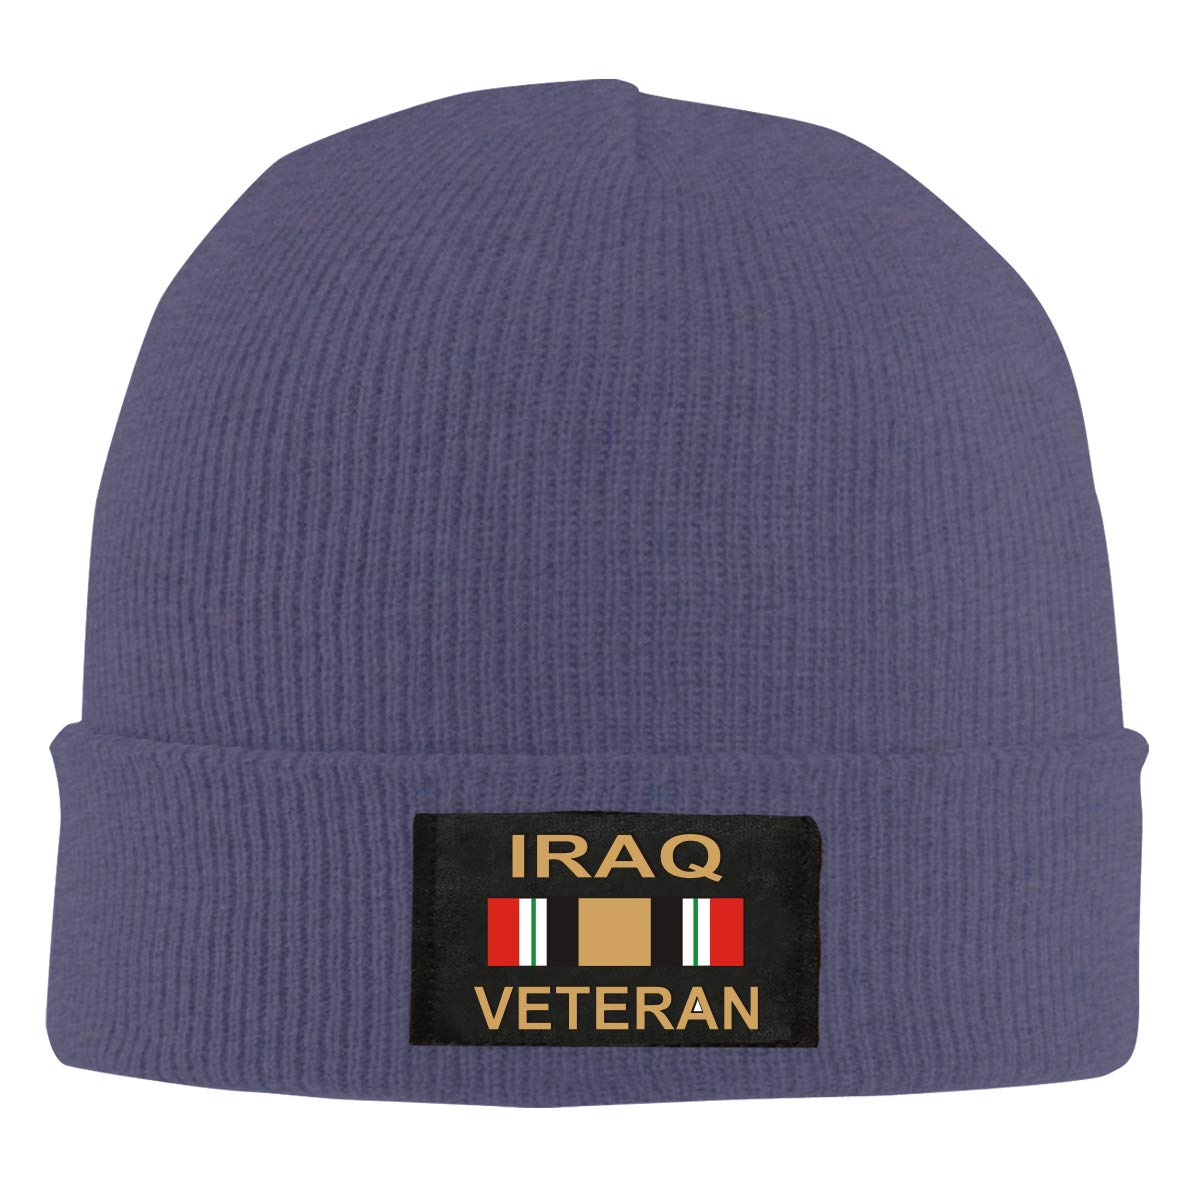 Iraq Veteran Unisex Warm Winter Hat Knit Beanie Skull Cap Cuff Beanie Hat Winter Hats